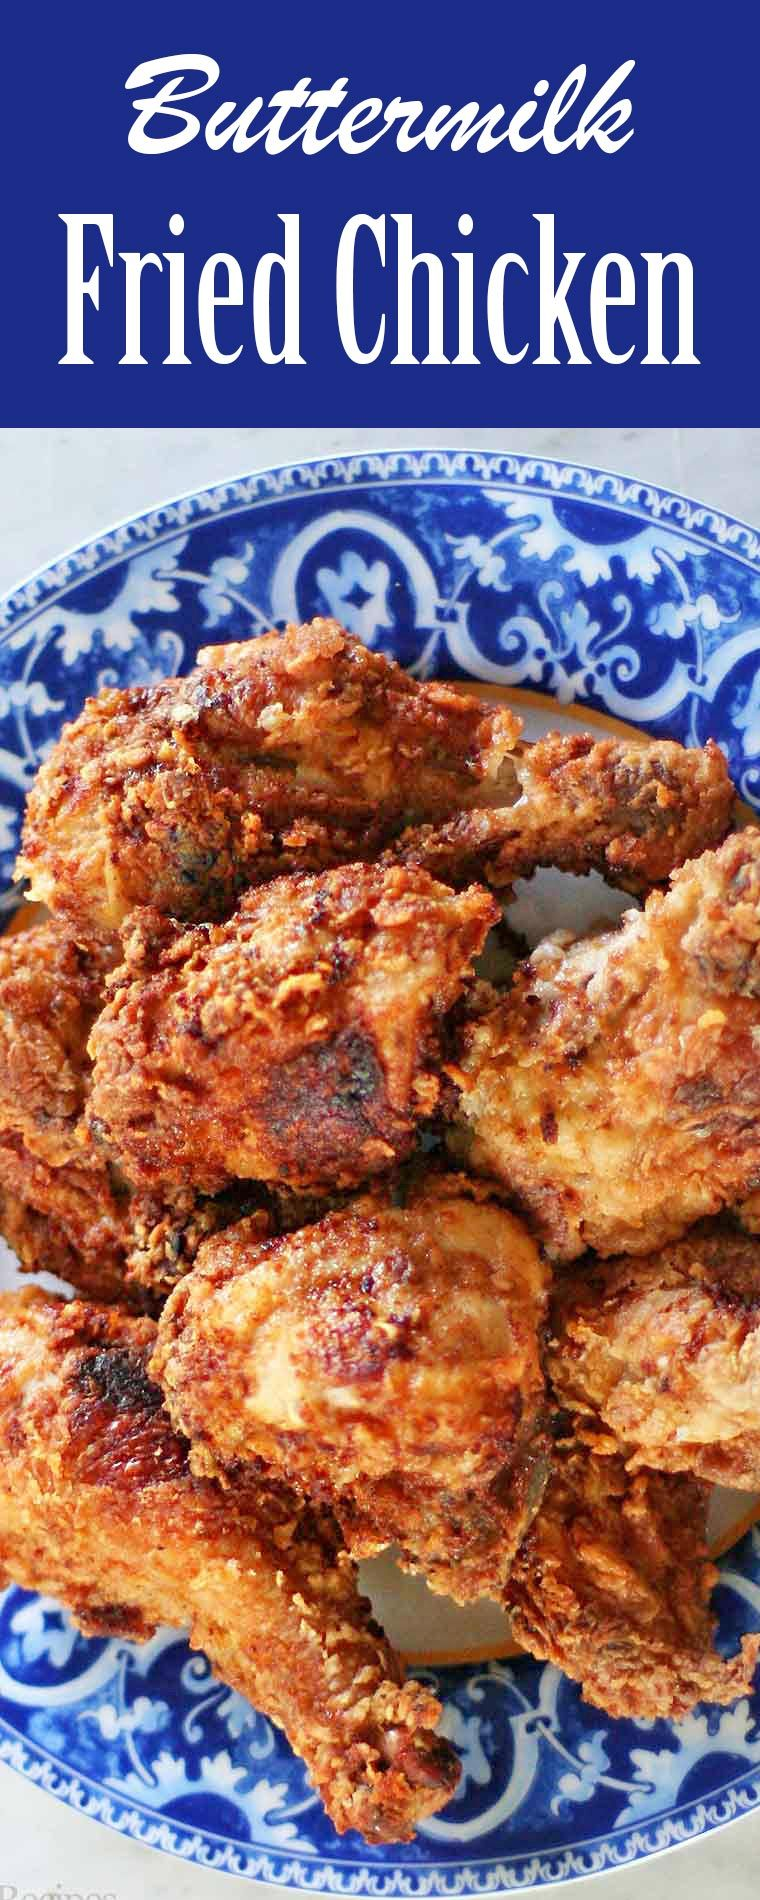 Buttermilk Fried Chicken Recipe A Southern New Year Chicken Recipes Yummy Chicken Recipes Buttermilk Fried Chicken